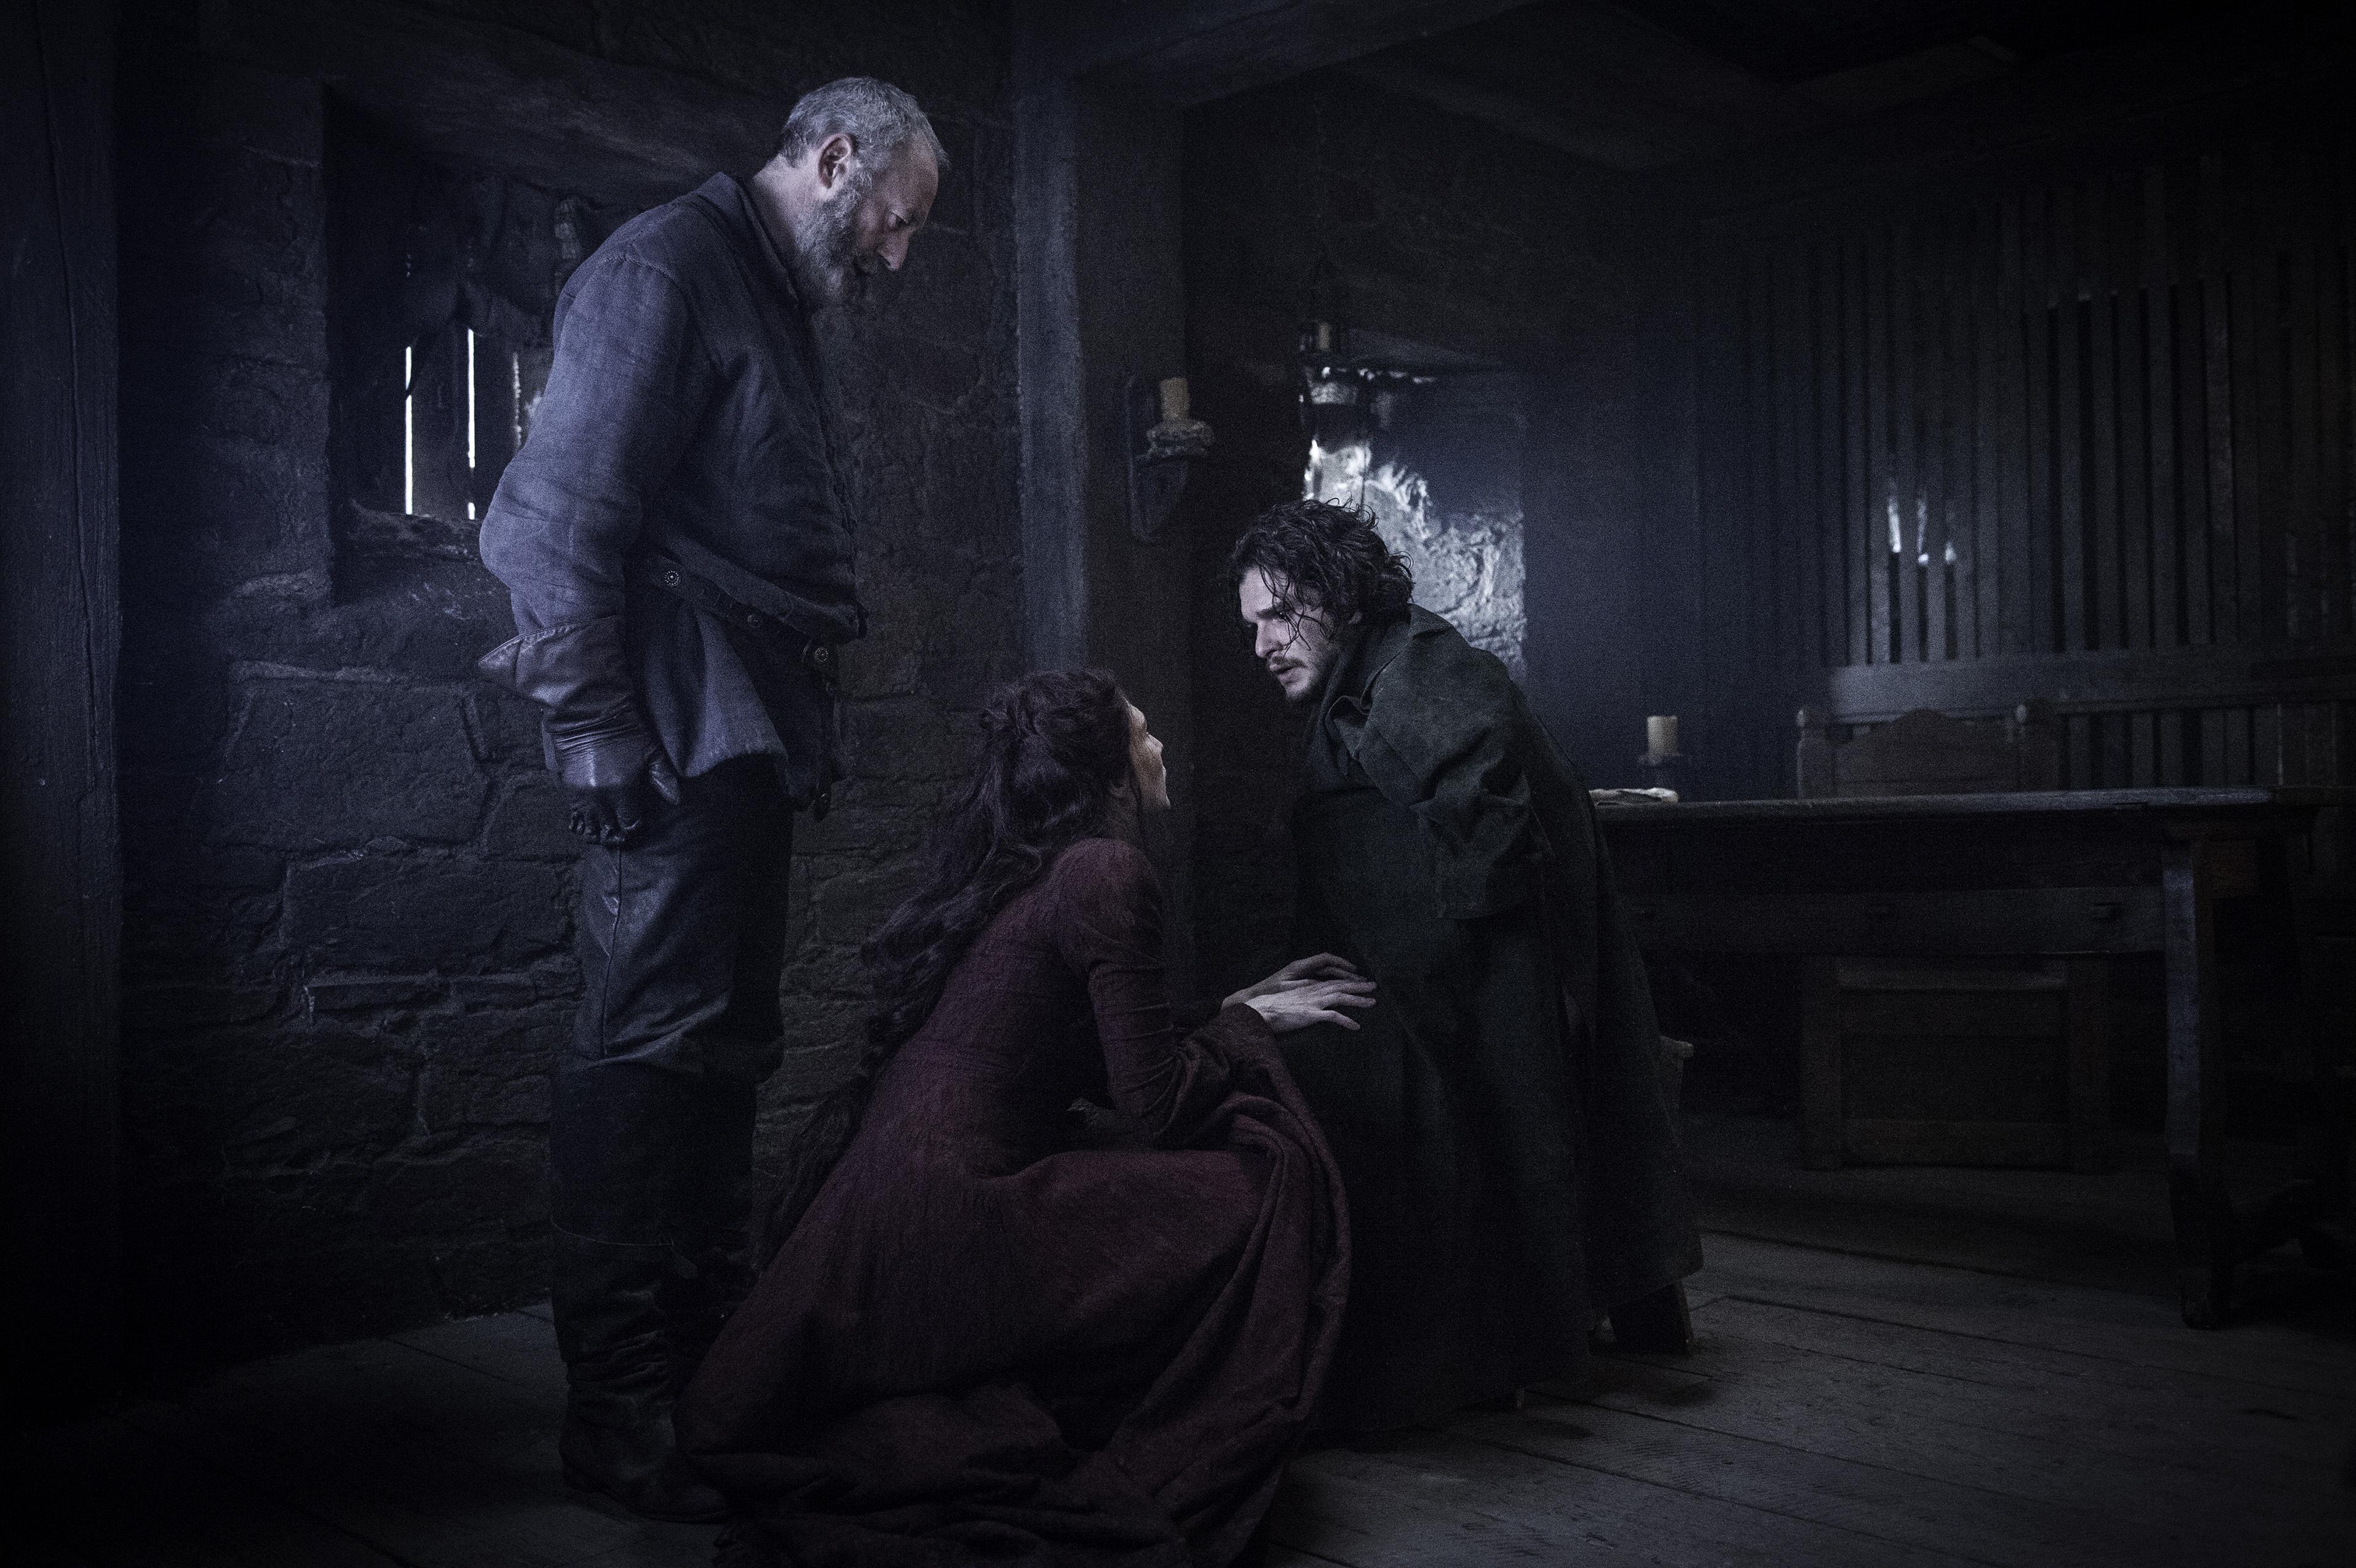 Liam Cunningham as Ser Davos, Carice van Houten as Melisandre and Kit Harington as Jon Snow